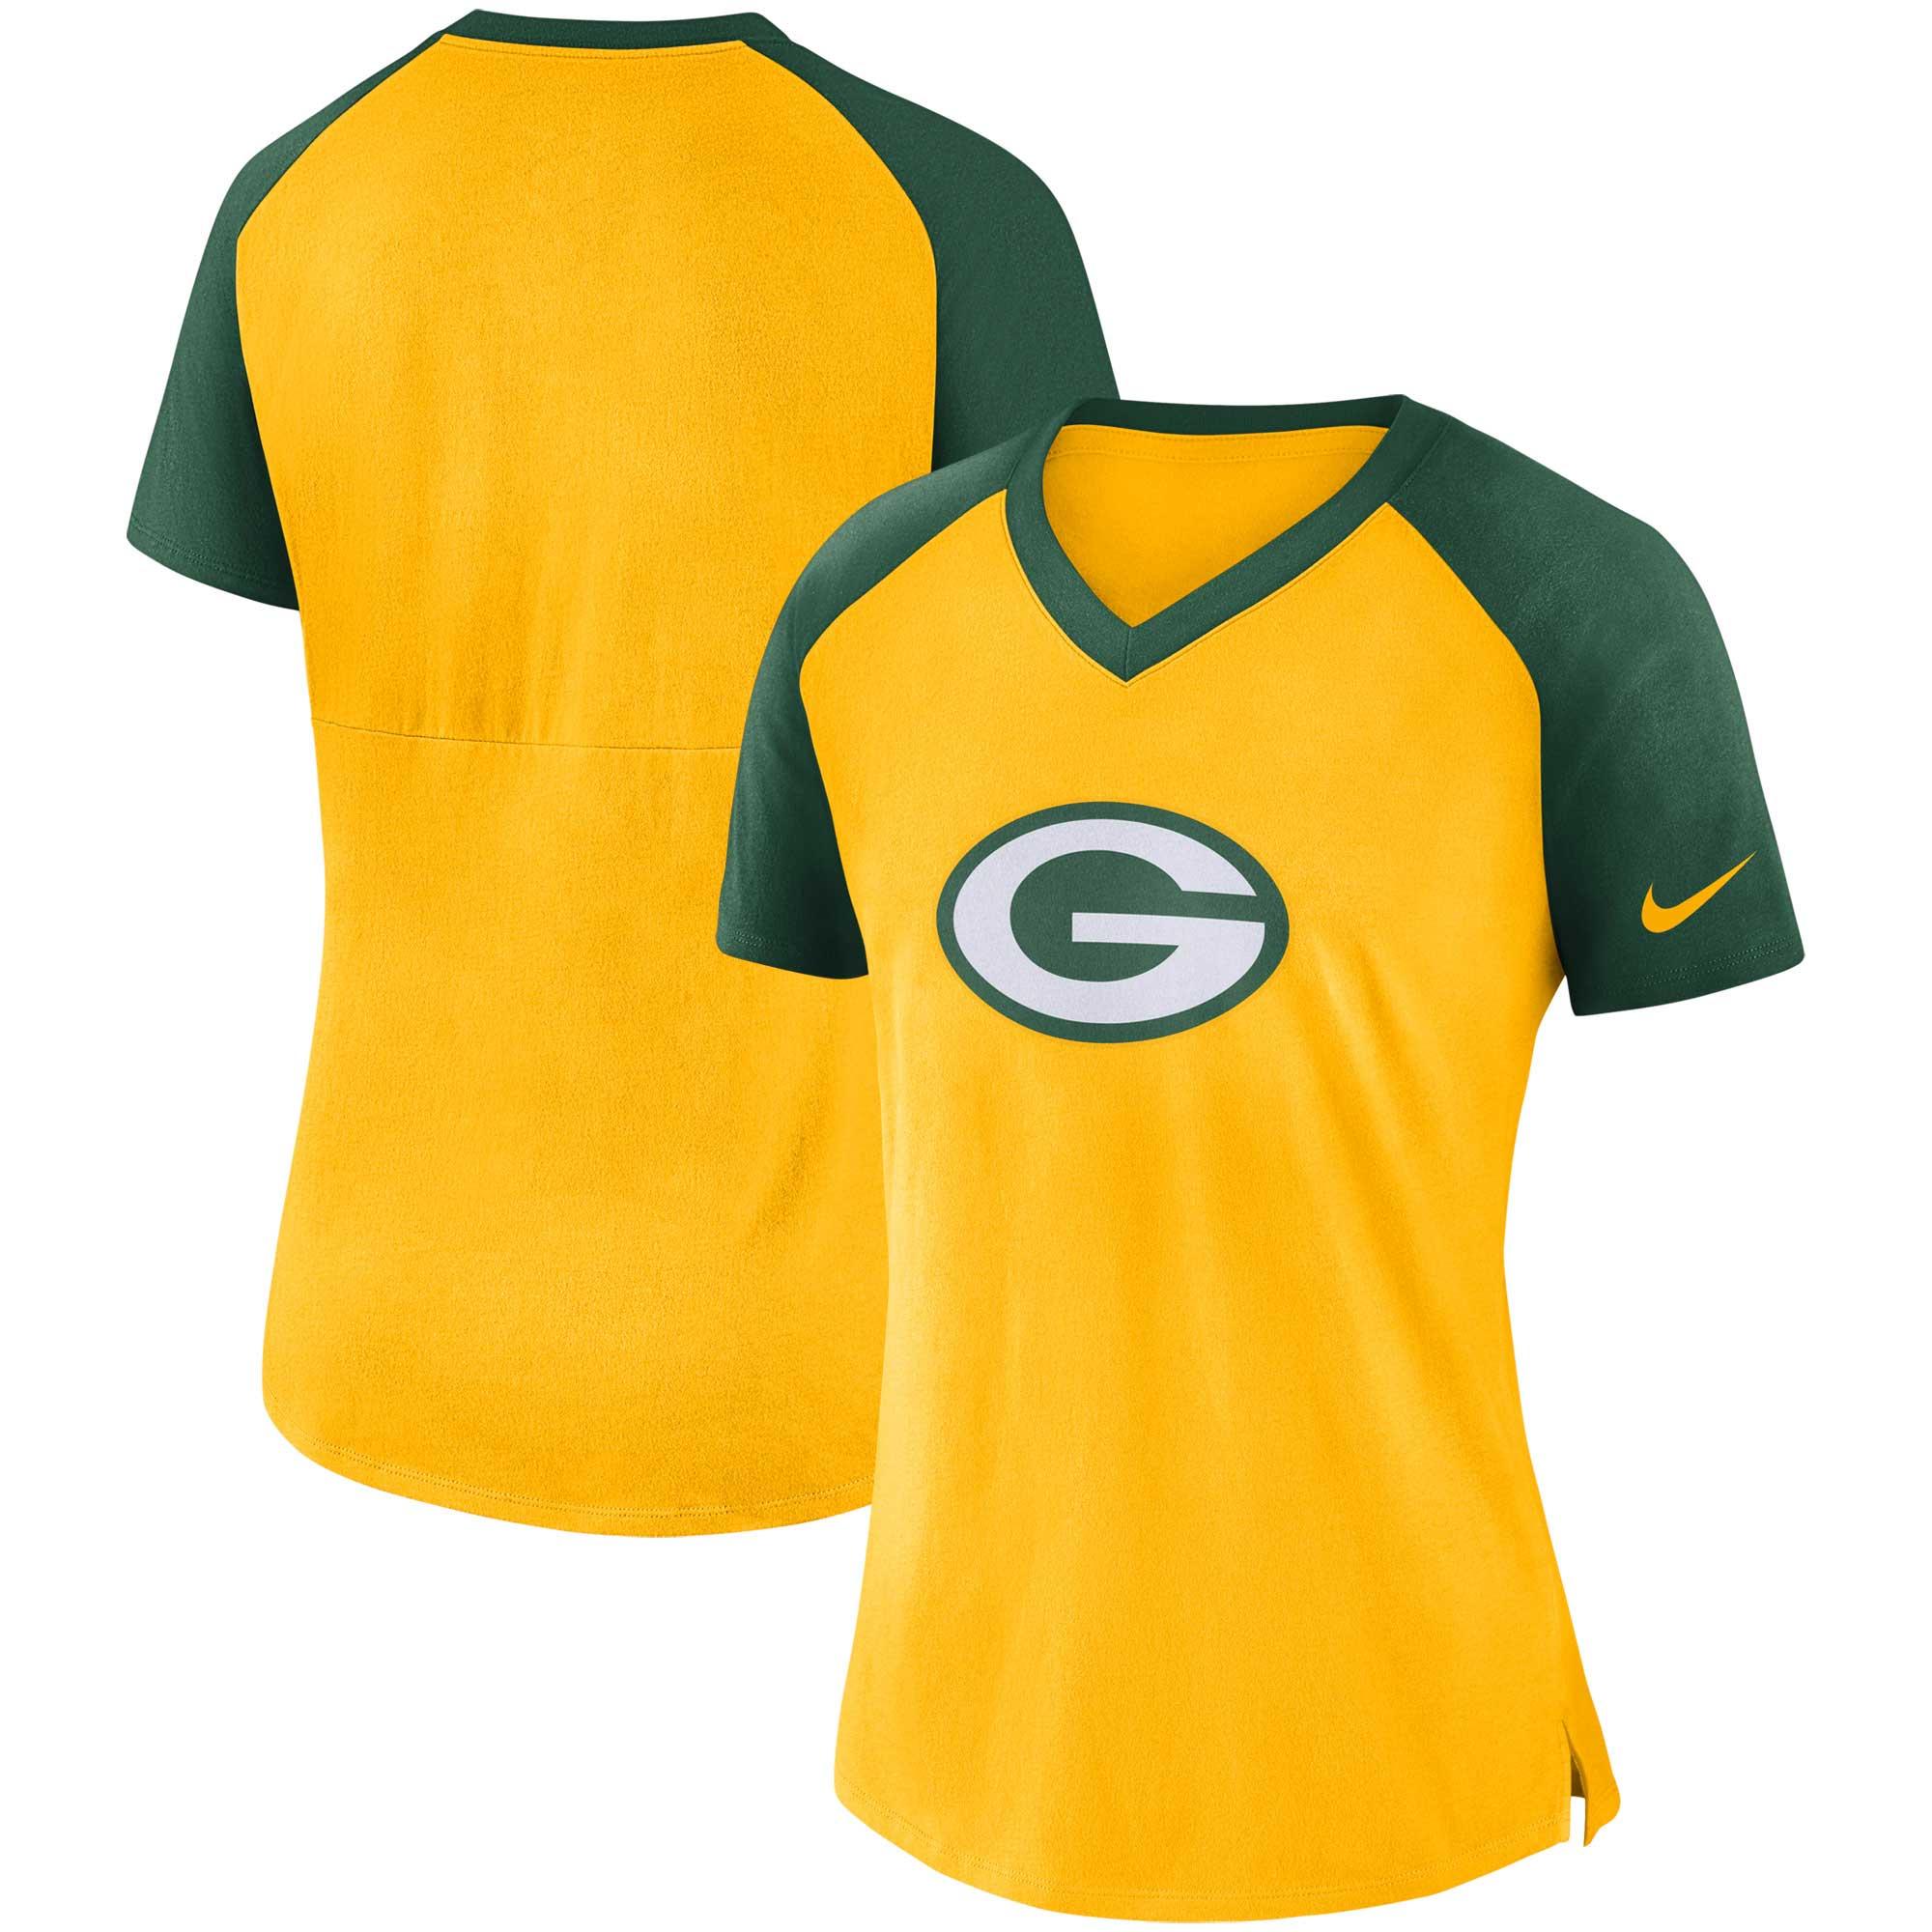 Green Bay Packers Nike Women's Top V-Neck T-Shirt - Gold/Green